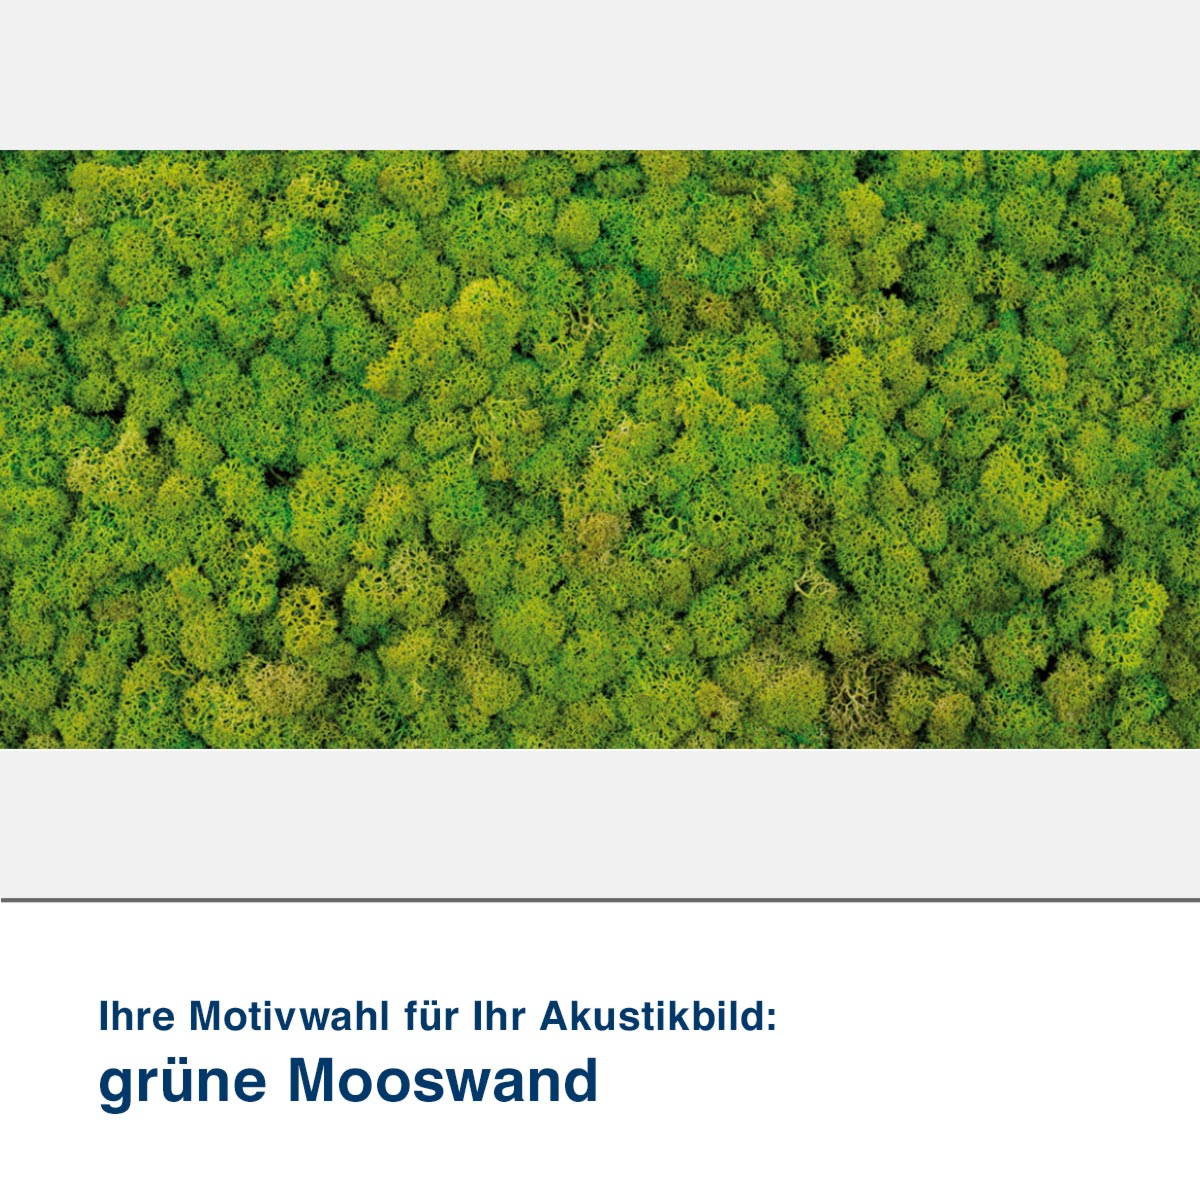 Akustikbild Motiv grüne Mooswand